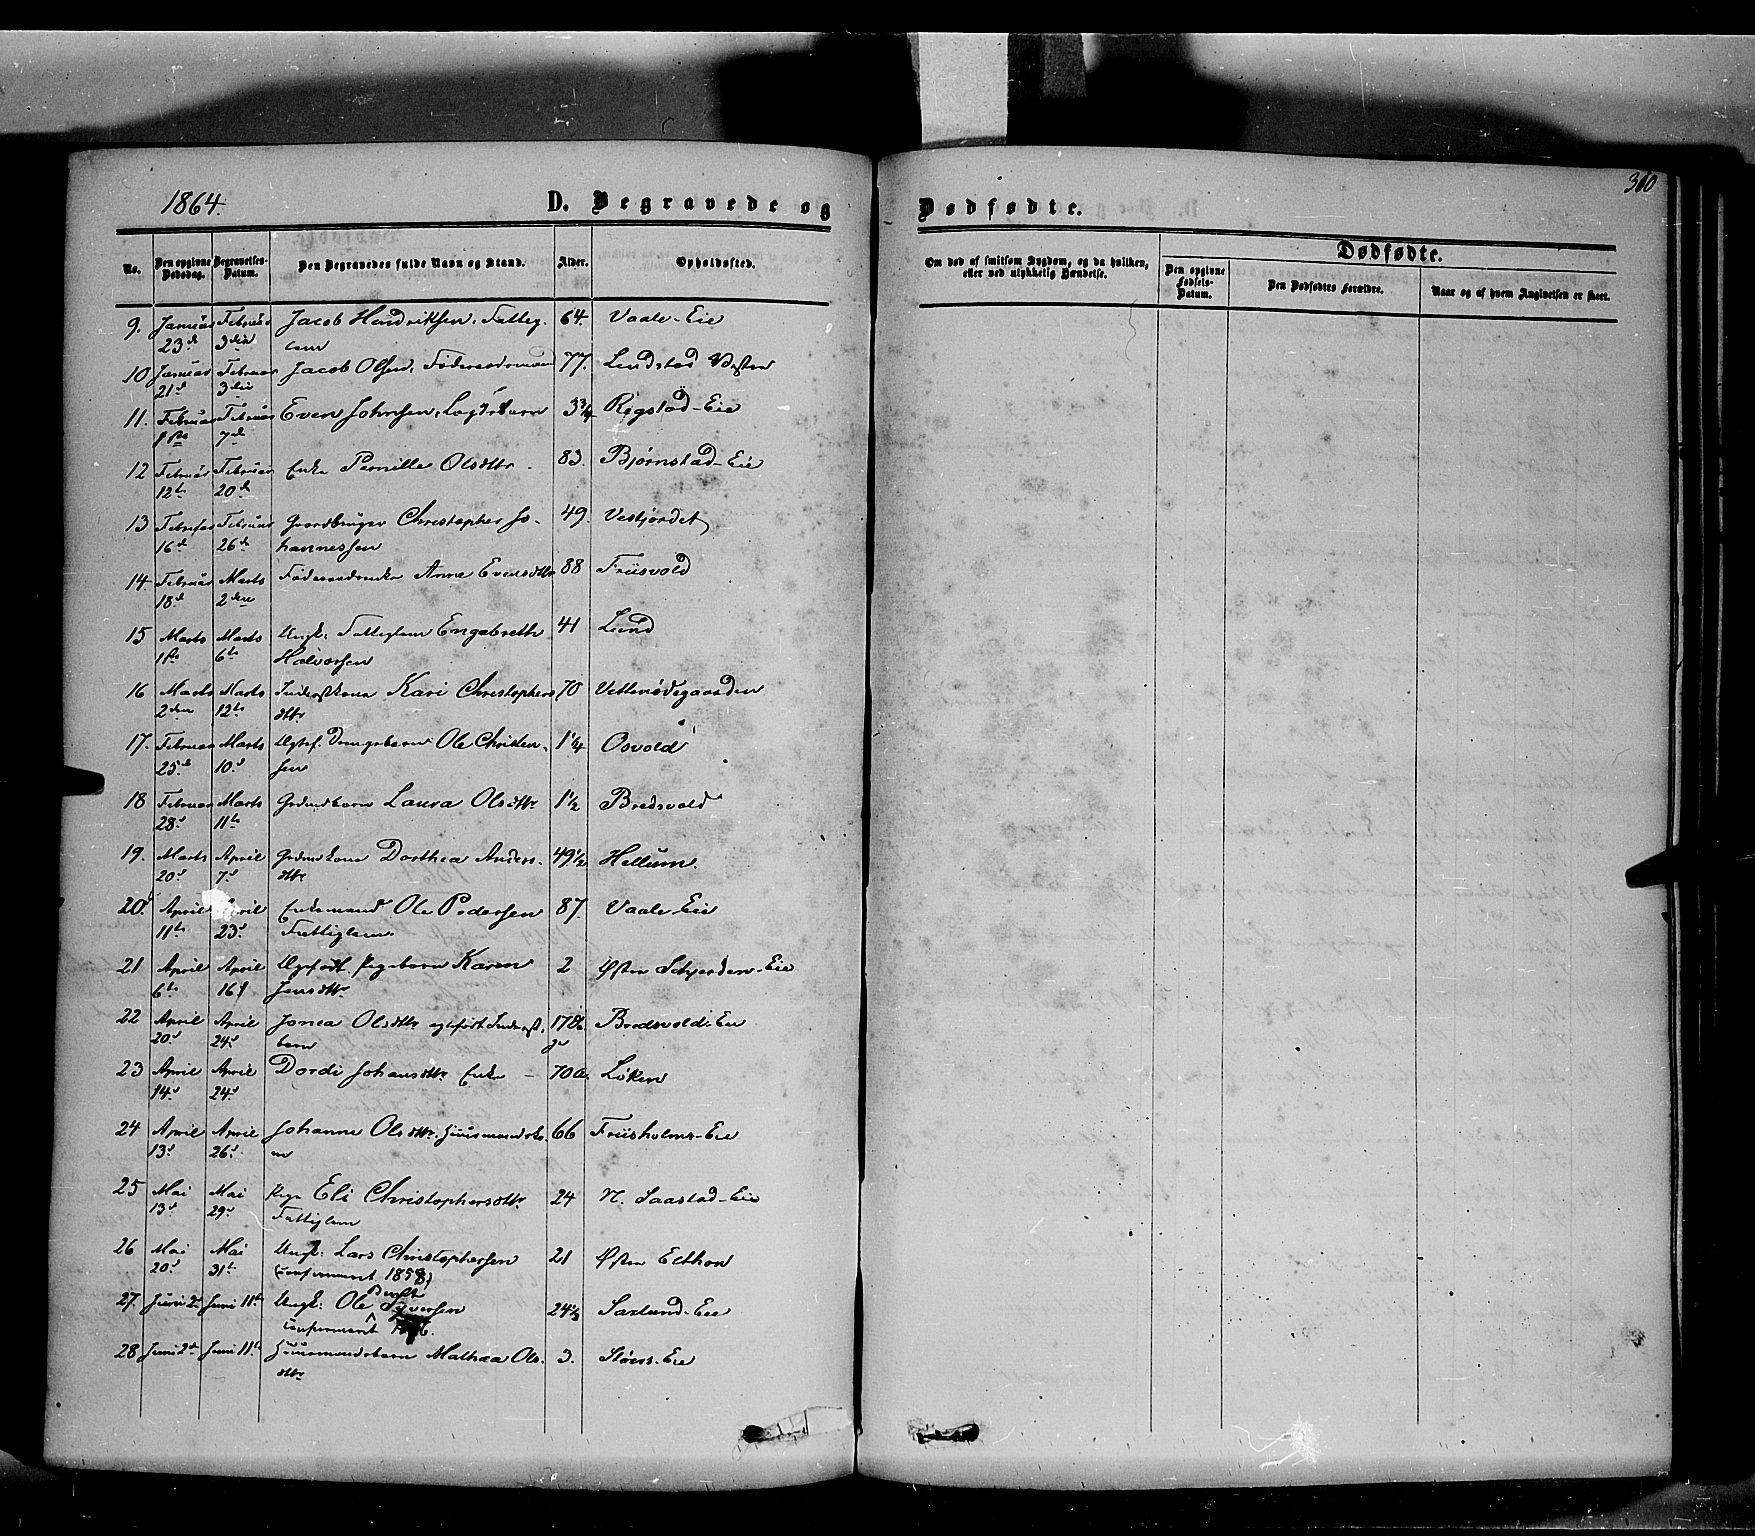 SAH, Stange prestekontor, K/L0013: Ministerialbok nr. 13, 1862-1879, s. 310